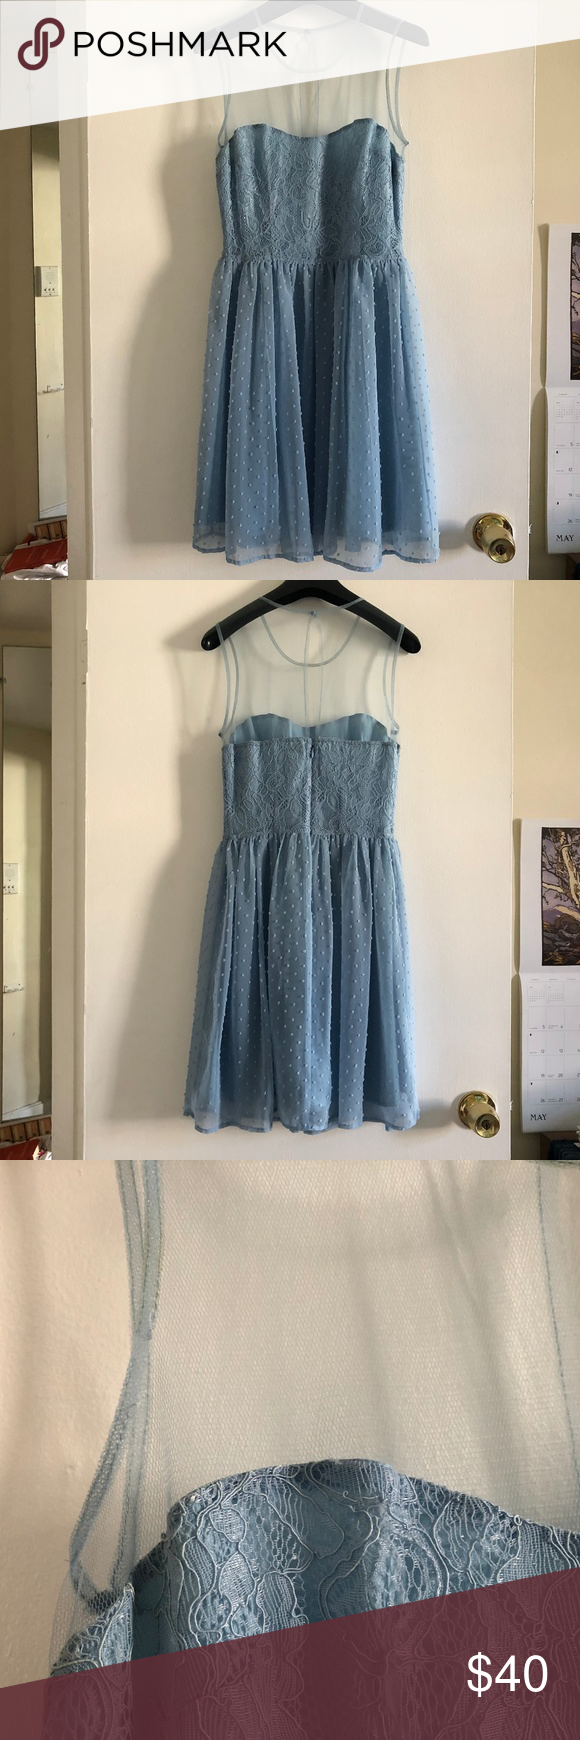 Rodarte For Target Blue Lace Swiss Dot Dress Swiss Dot Dress Light Blue Dresses Blue Lace [ 1740 x 580 Pixel ]